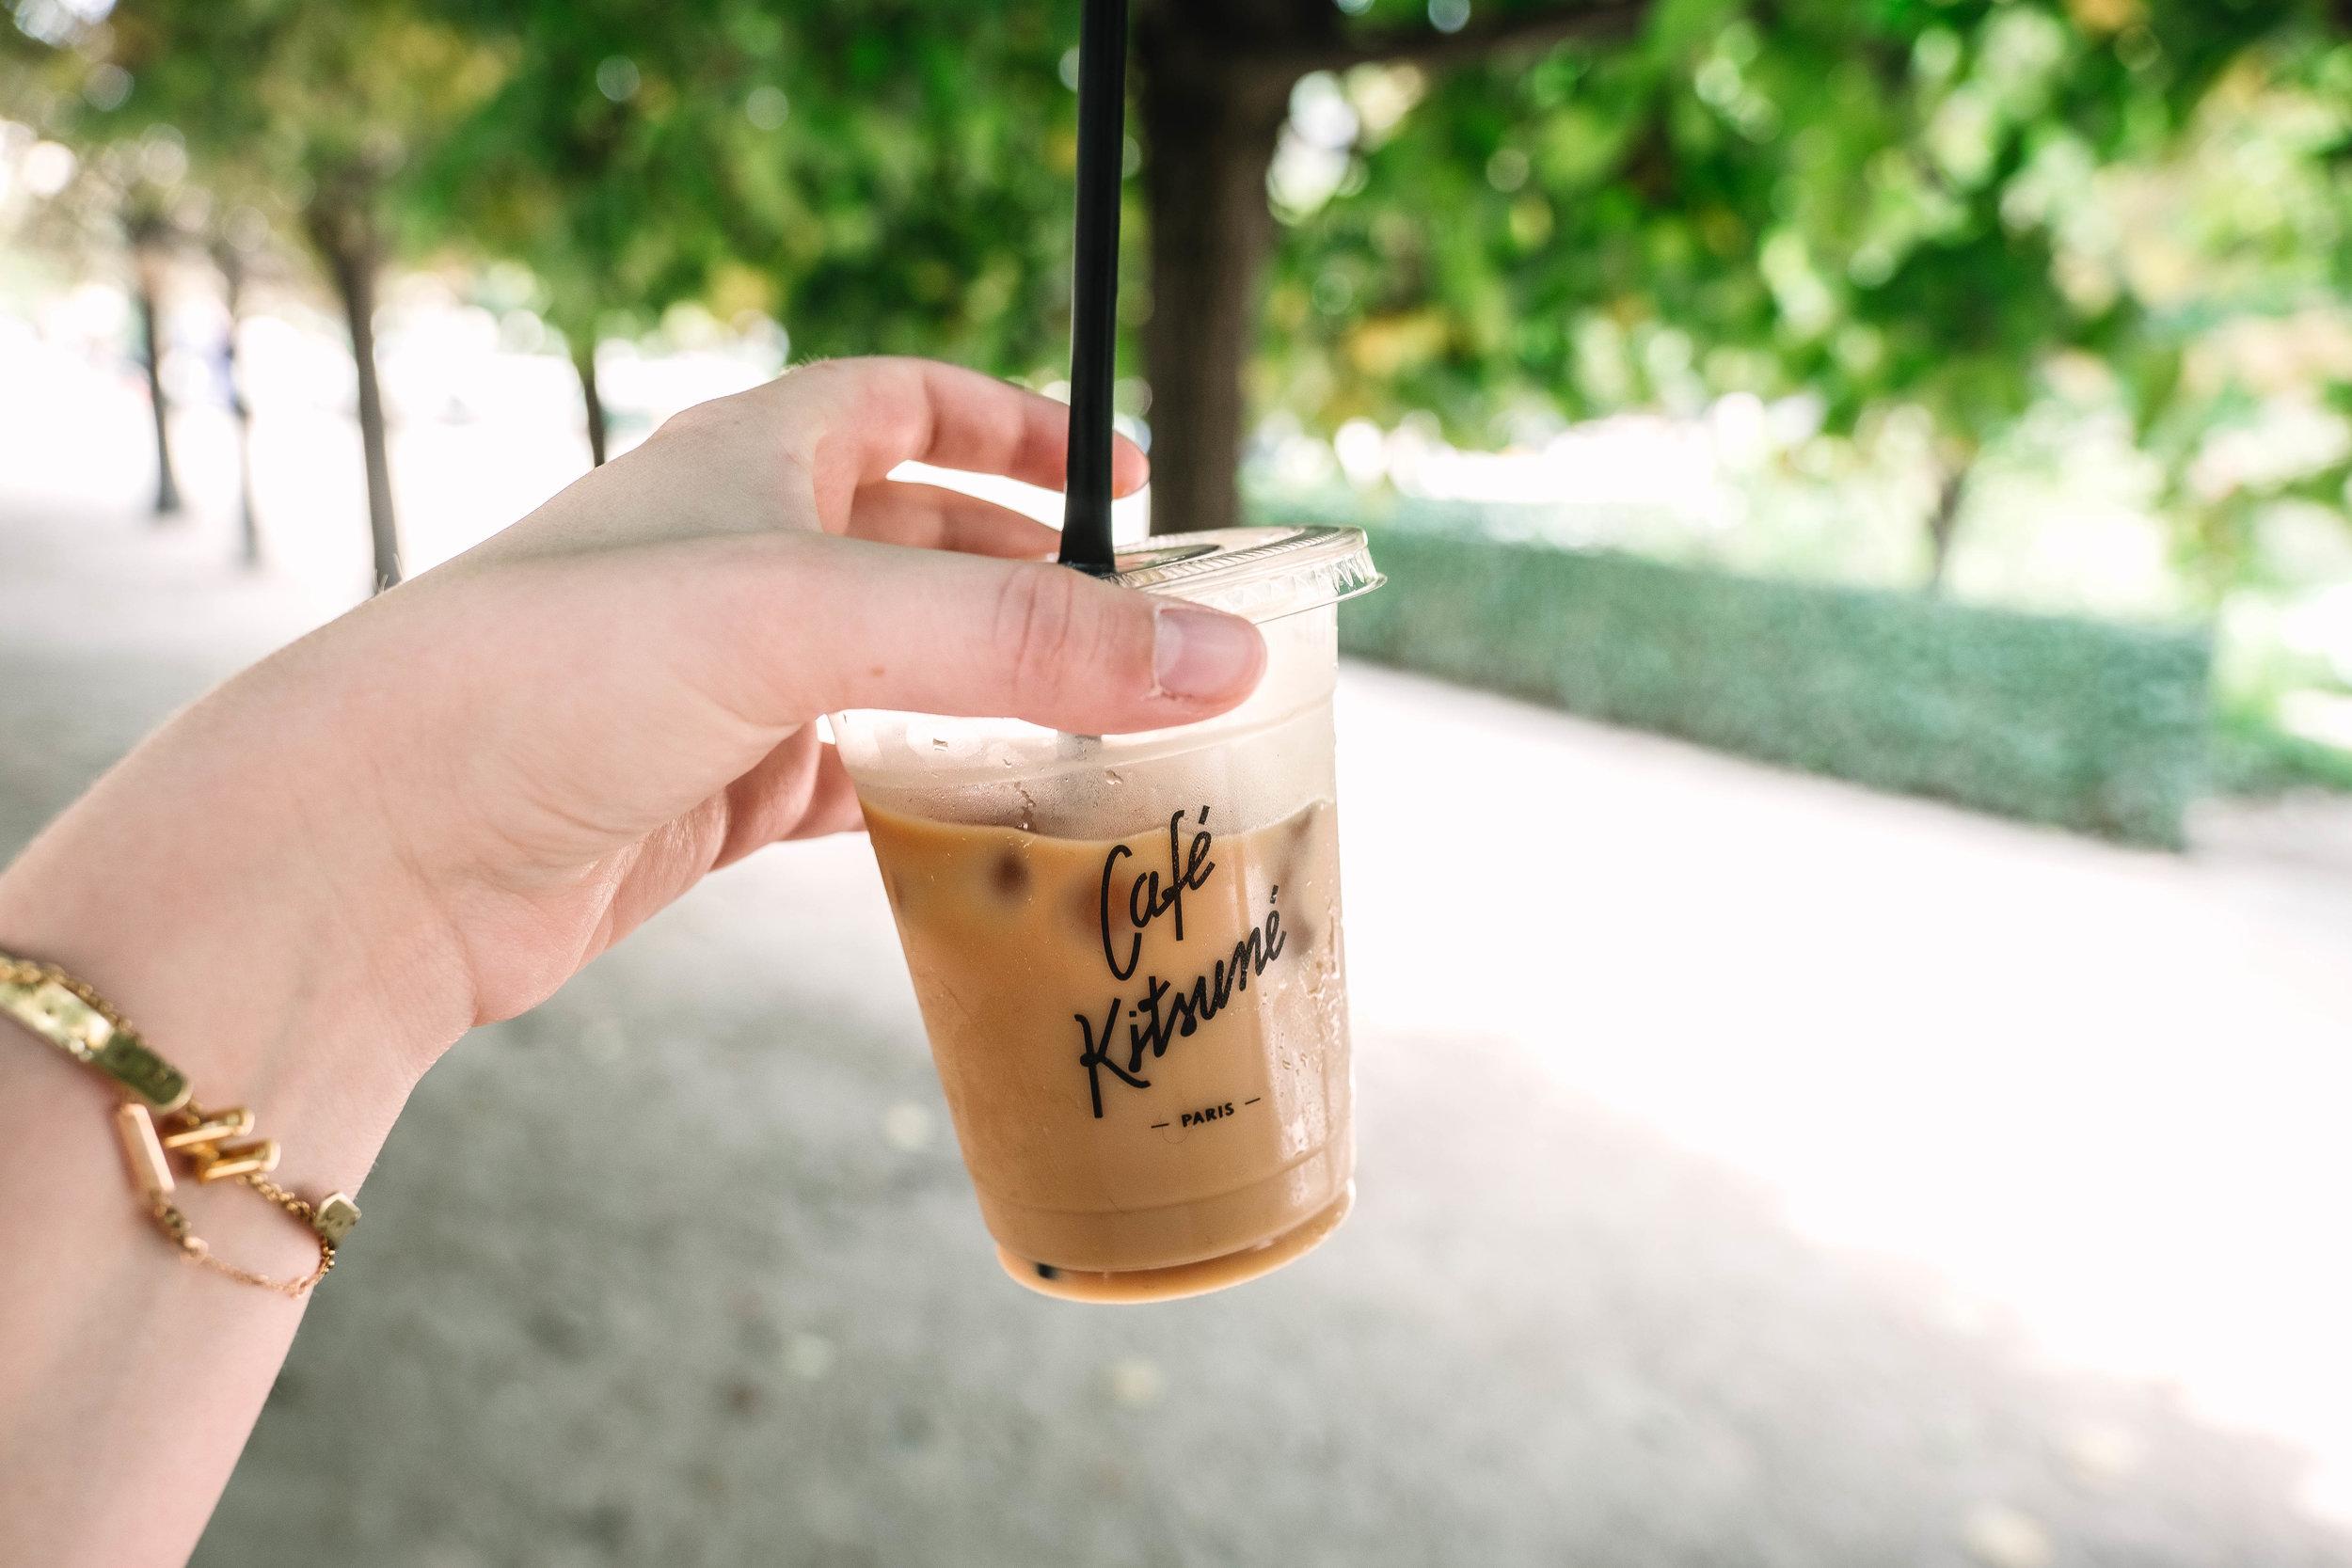 latte from Cafe Kitsune in the Jardin du Palais Royal